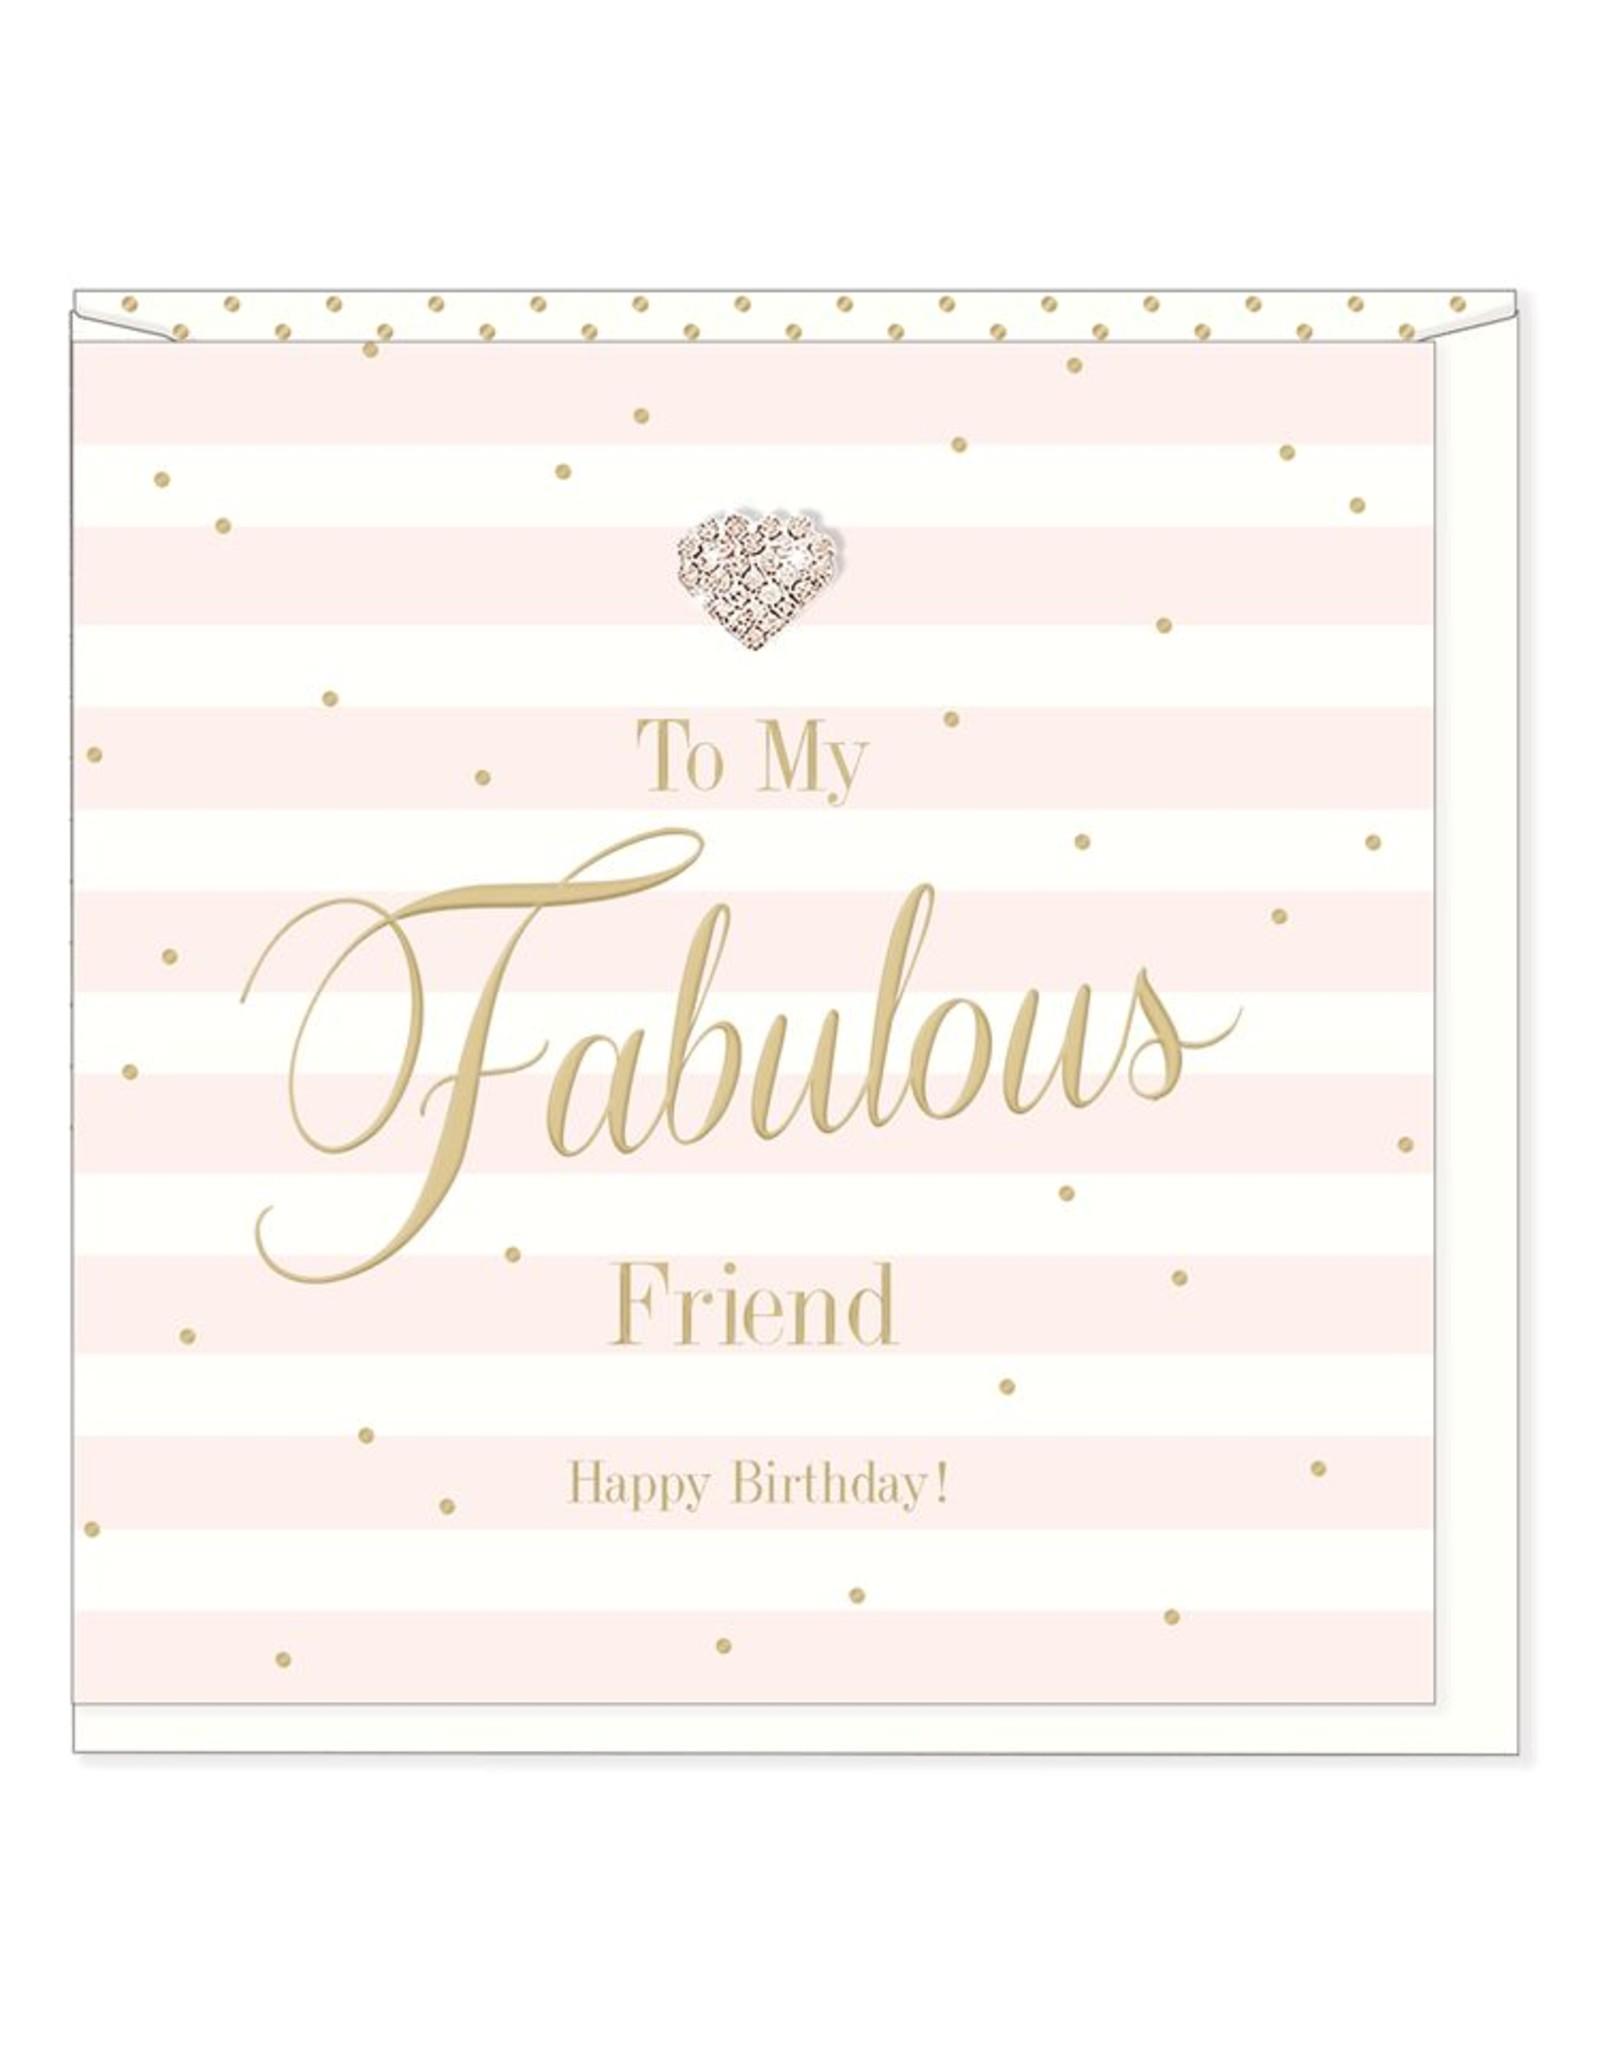 Hearts Design Wenskaart - Fabulous Friend - Birthday